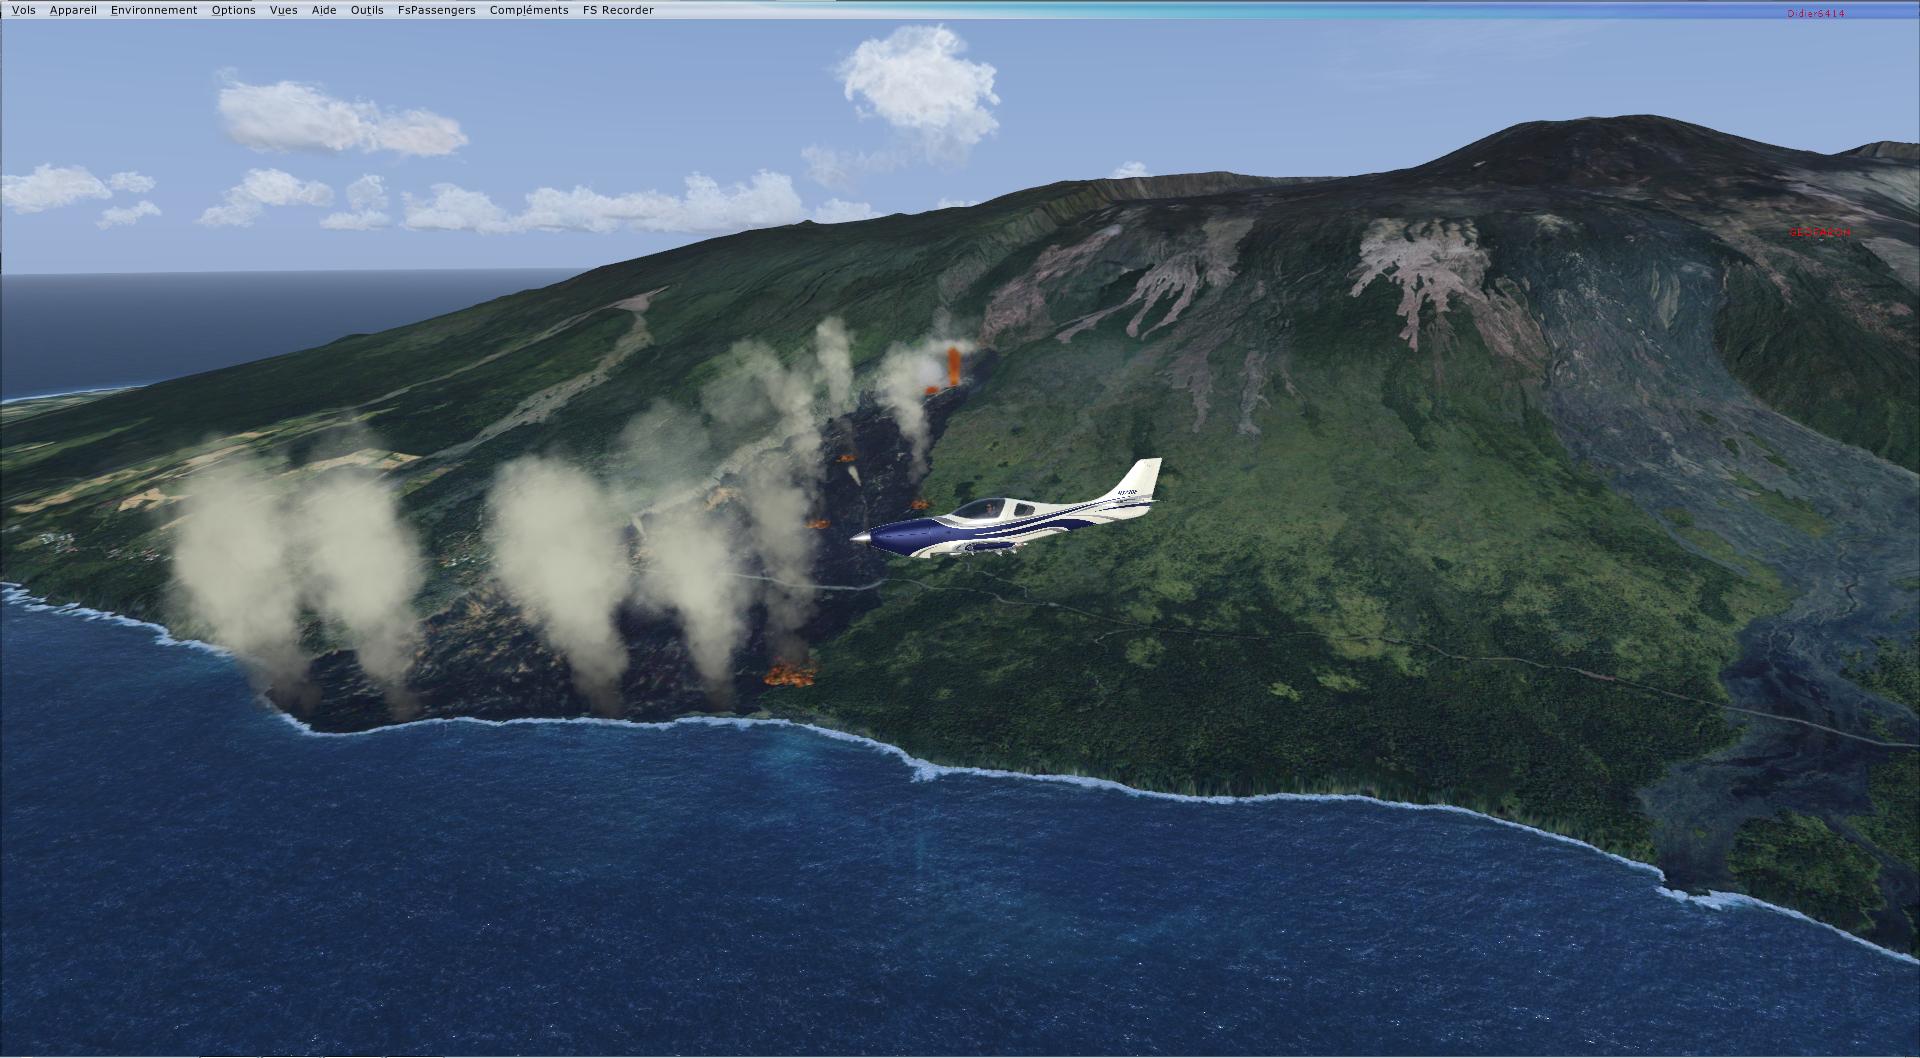 Essai demo X-Plane 10 - Page 2 6429102013628213017951